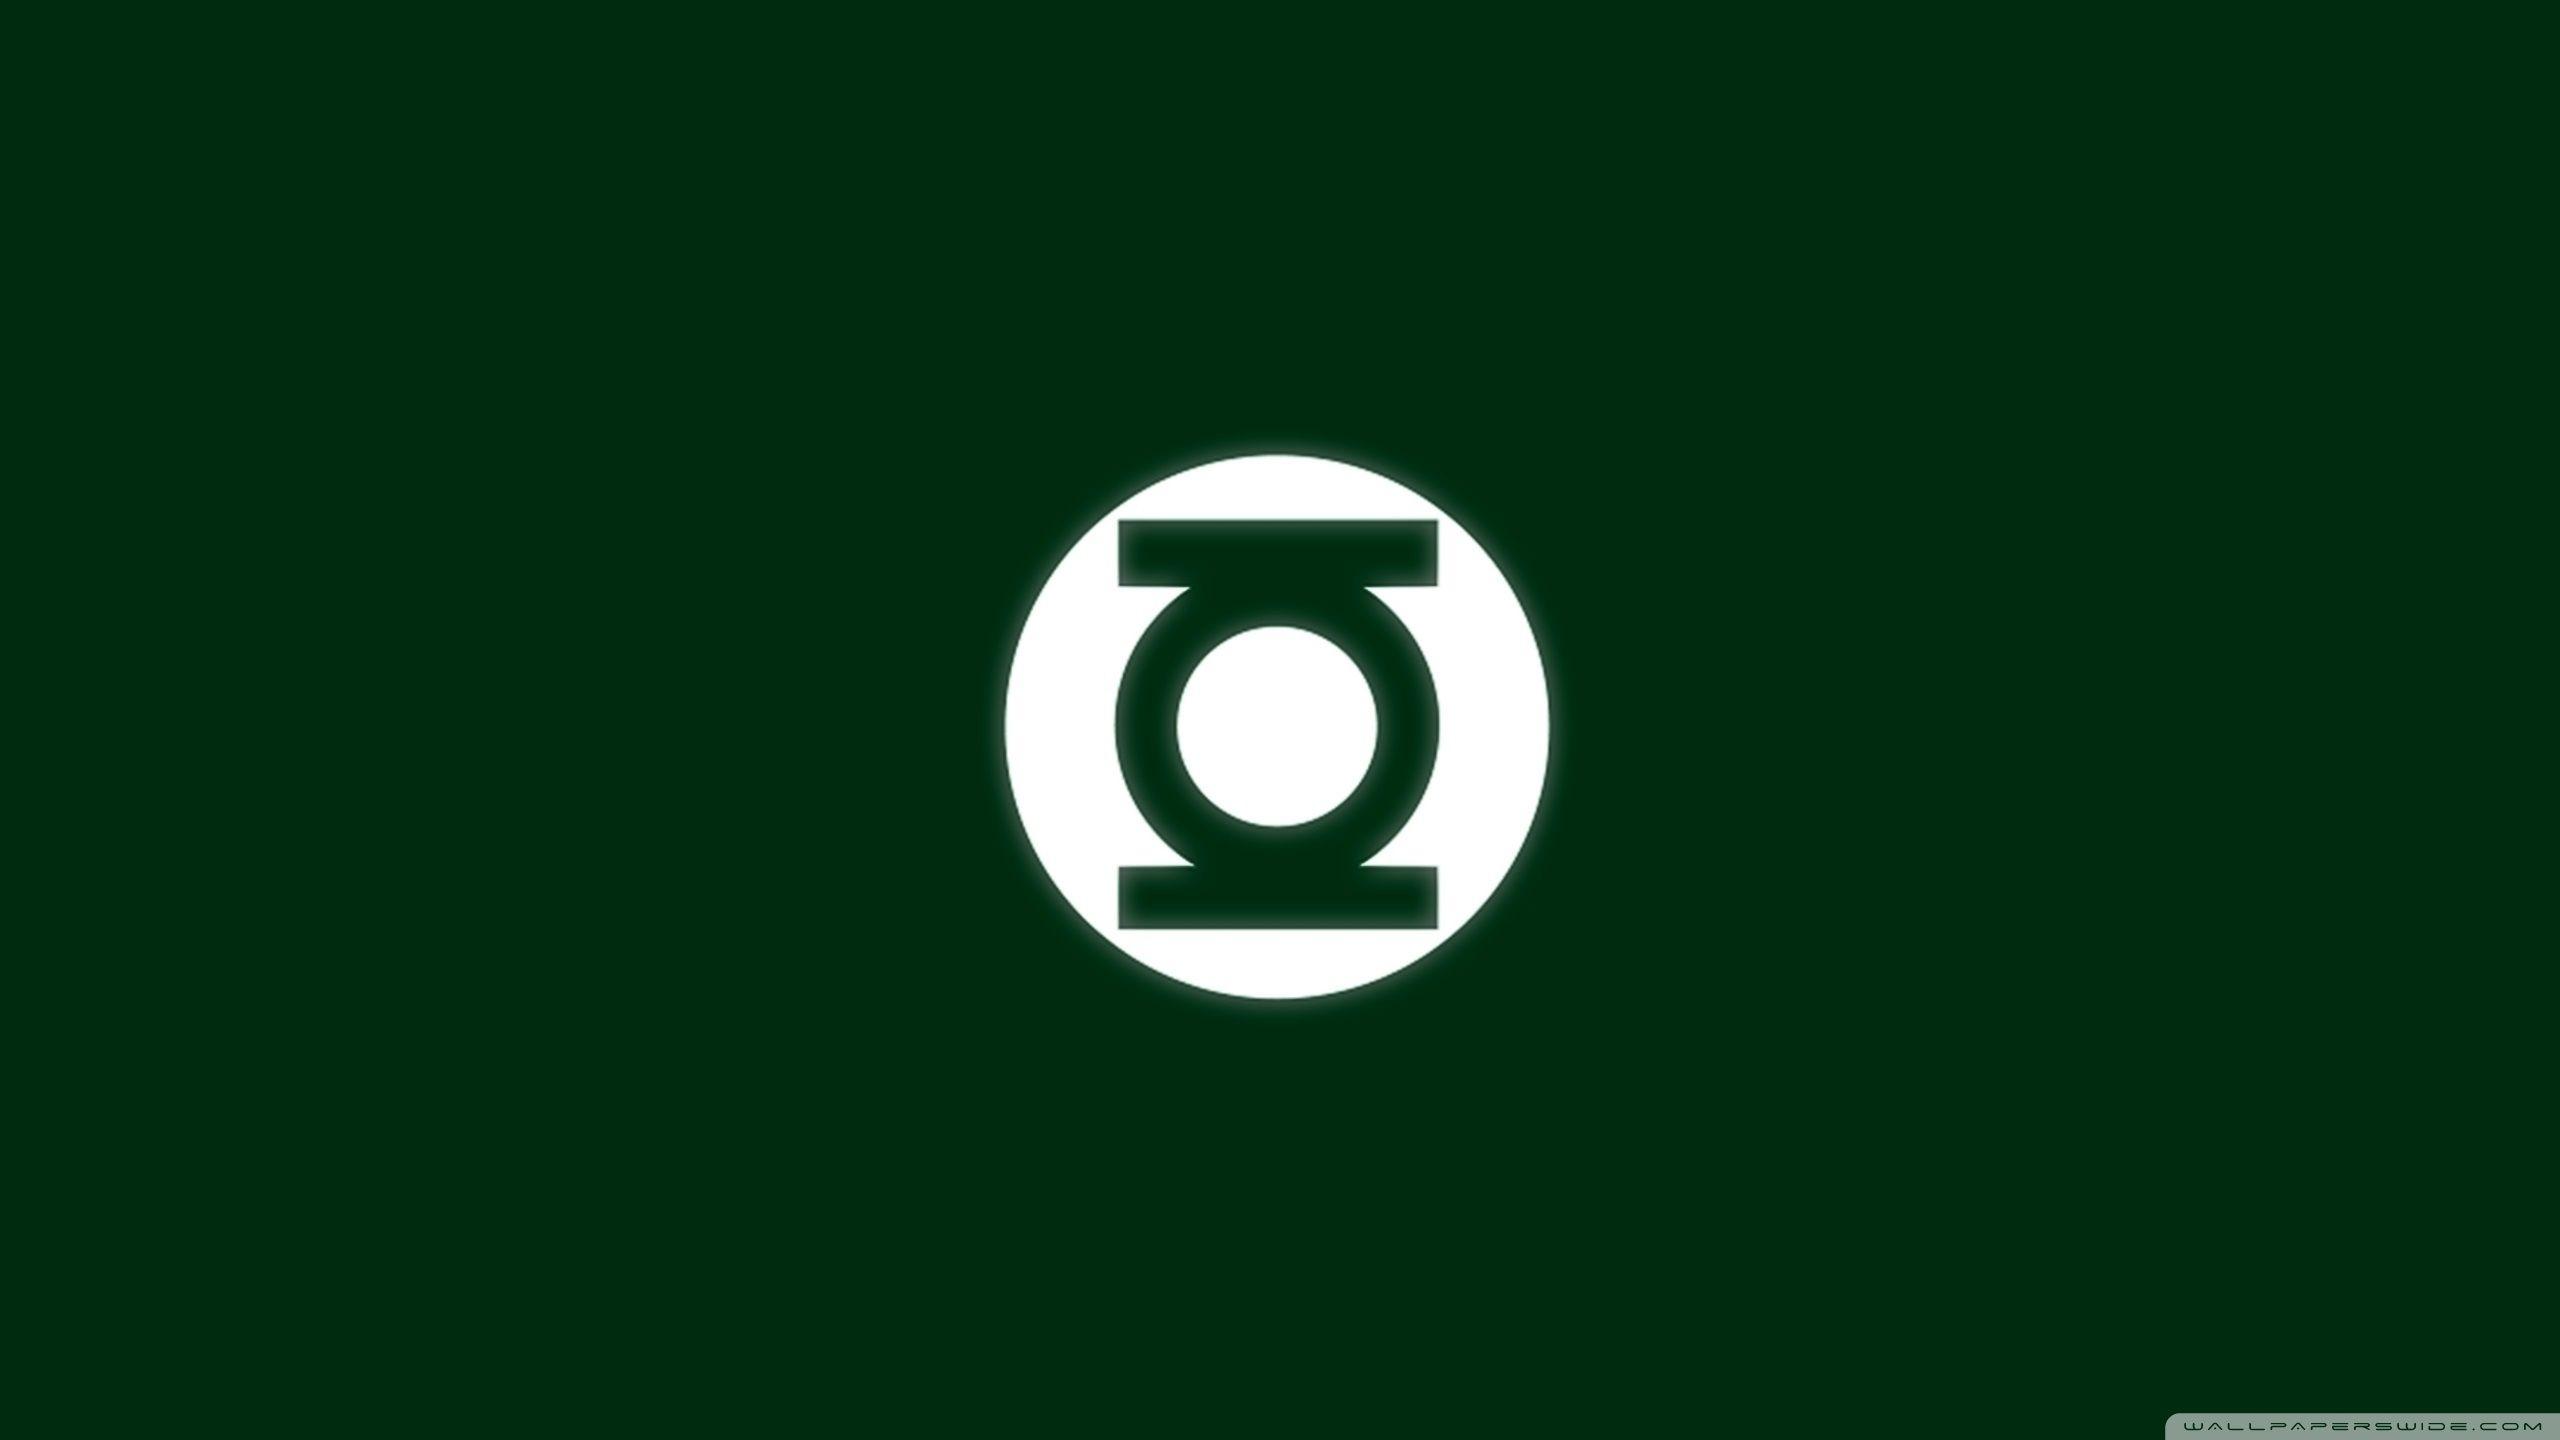 10 Top Green Lantern Logo Wallpaper Full Hd 1920 1080 For Pc Desktop Green Lantern Logo Green Lantern Green Lantern Wallpaper